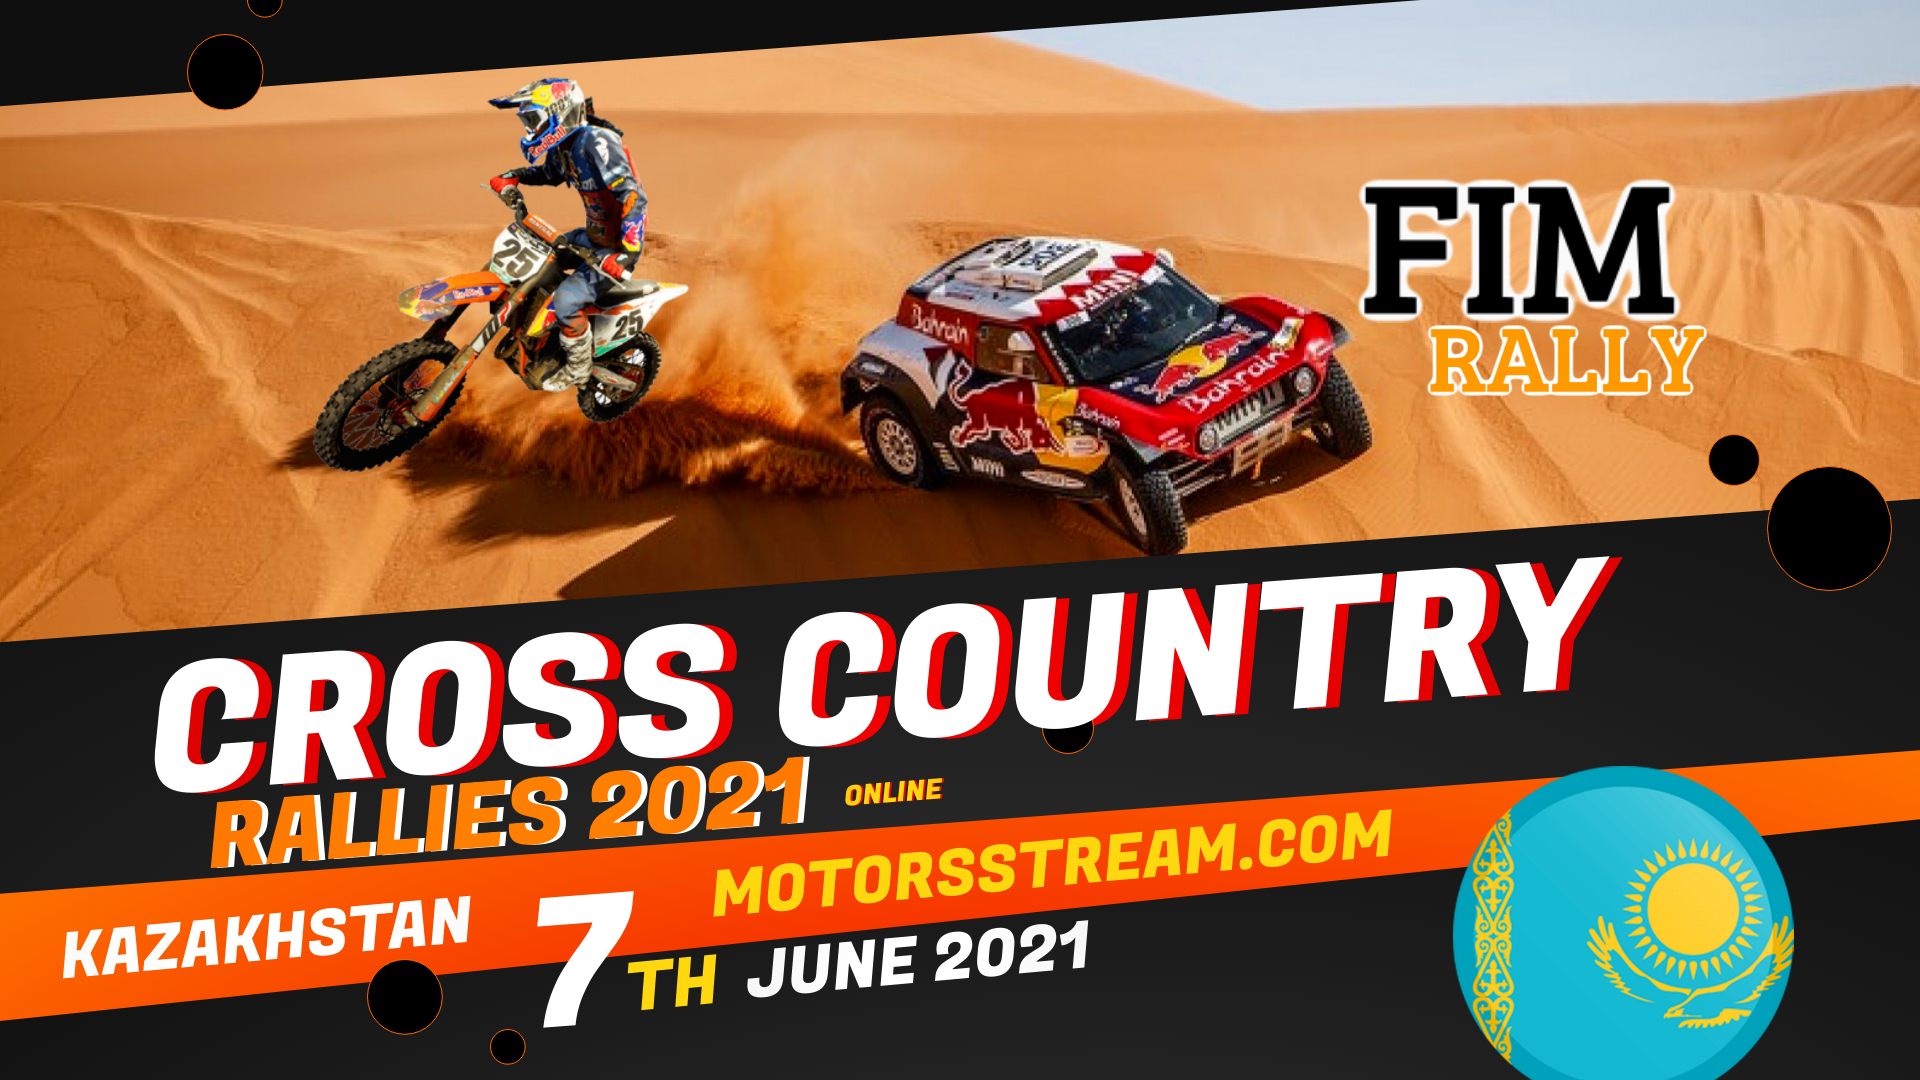 Kazakhstan Cross Country Rallies Live Stream 2021